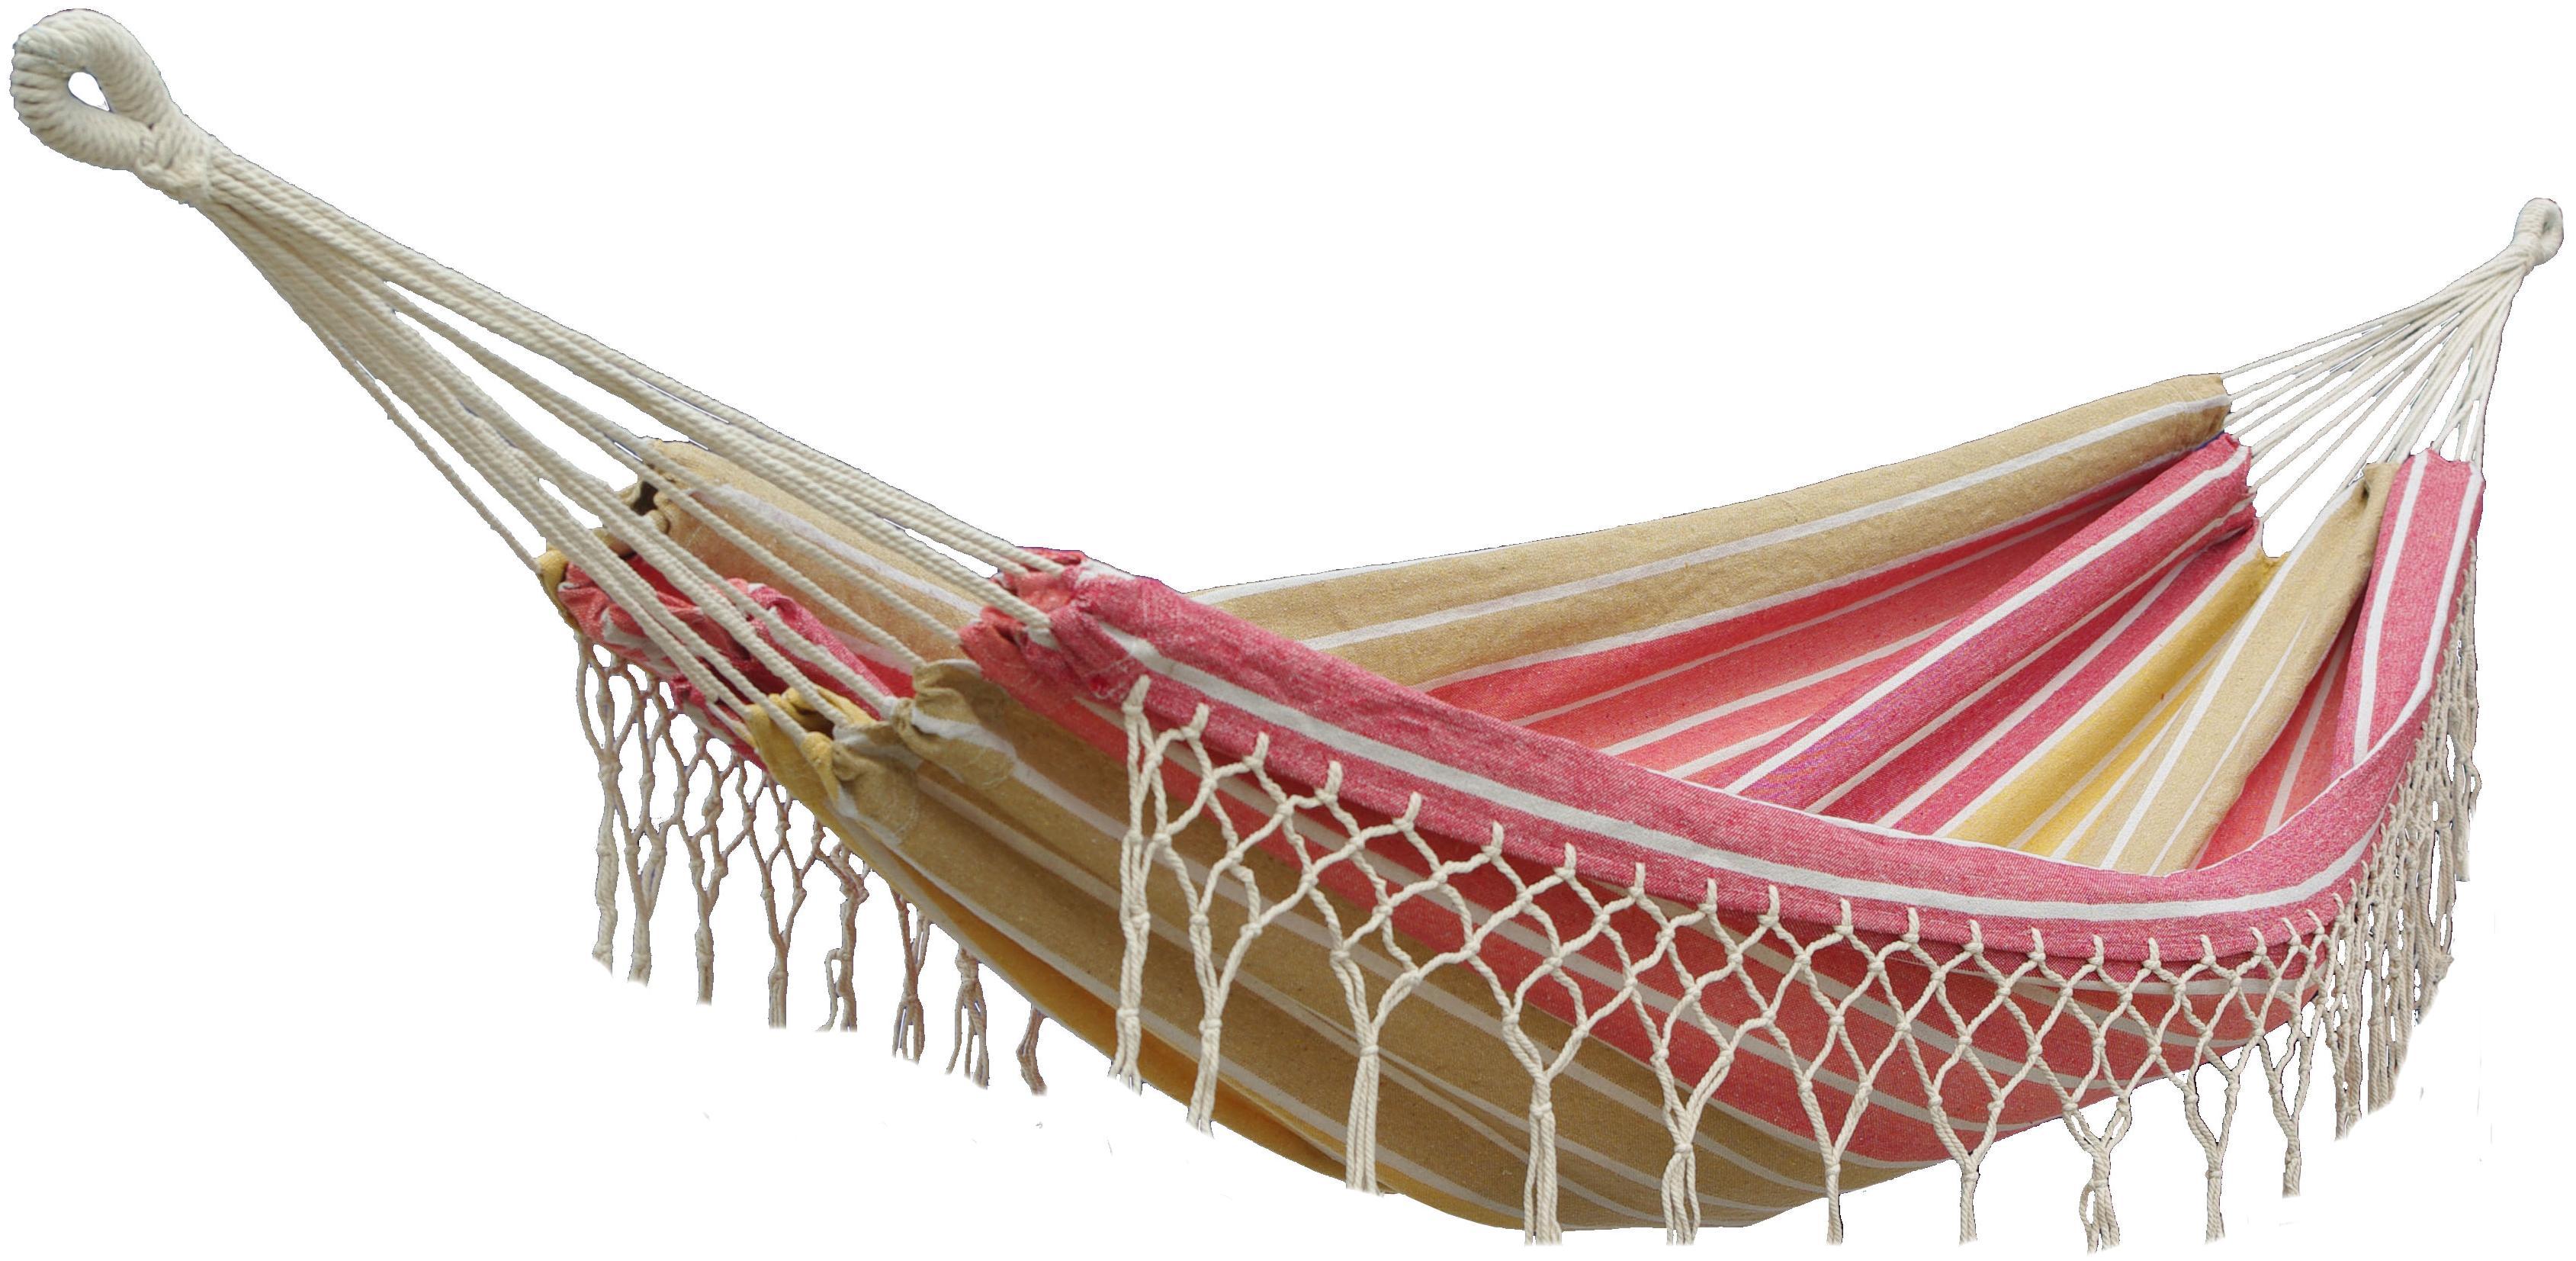 Houpací síť DUVLAN s krajkou 220 x 130 cm Barva: HA169